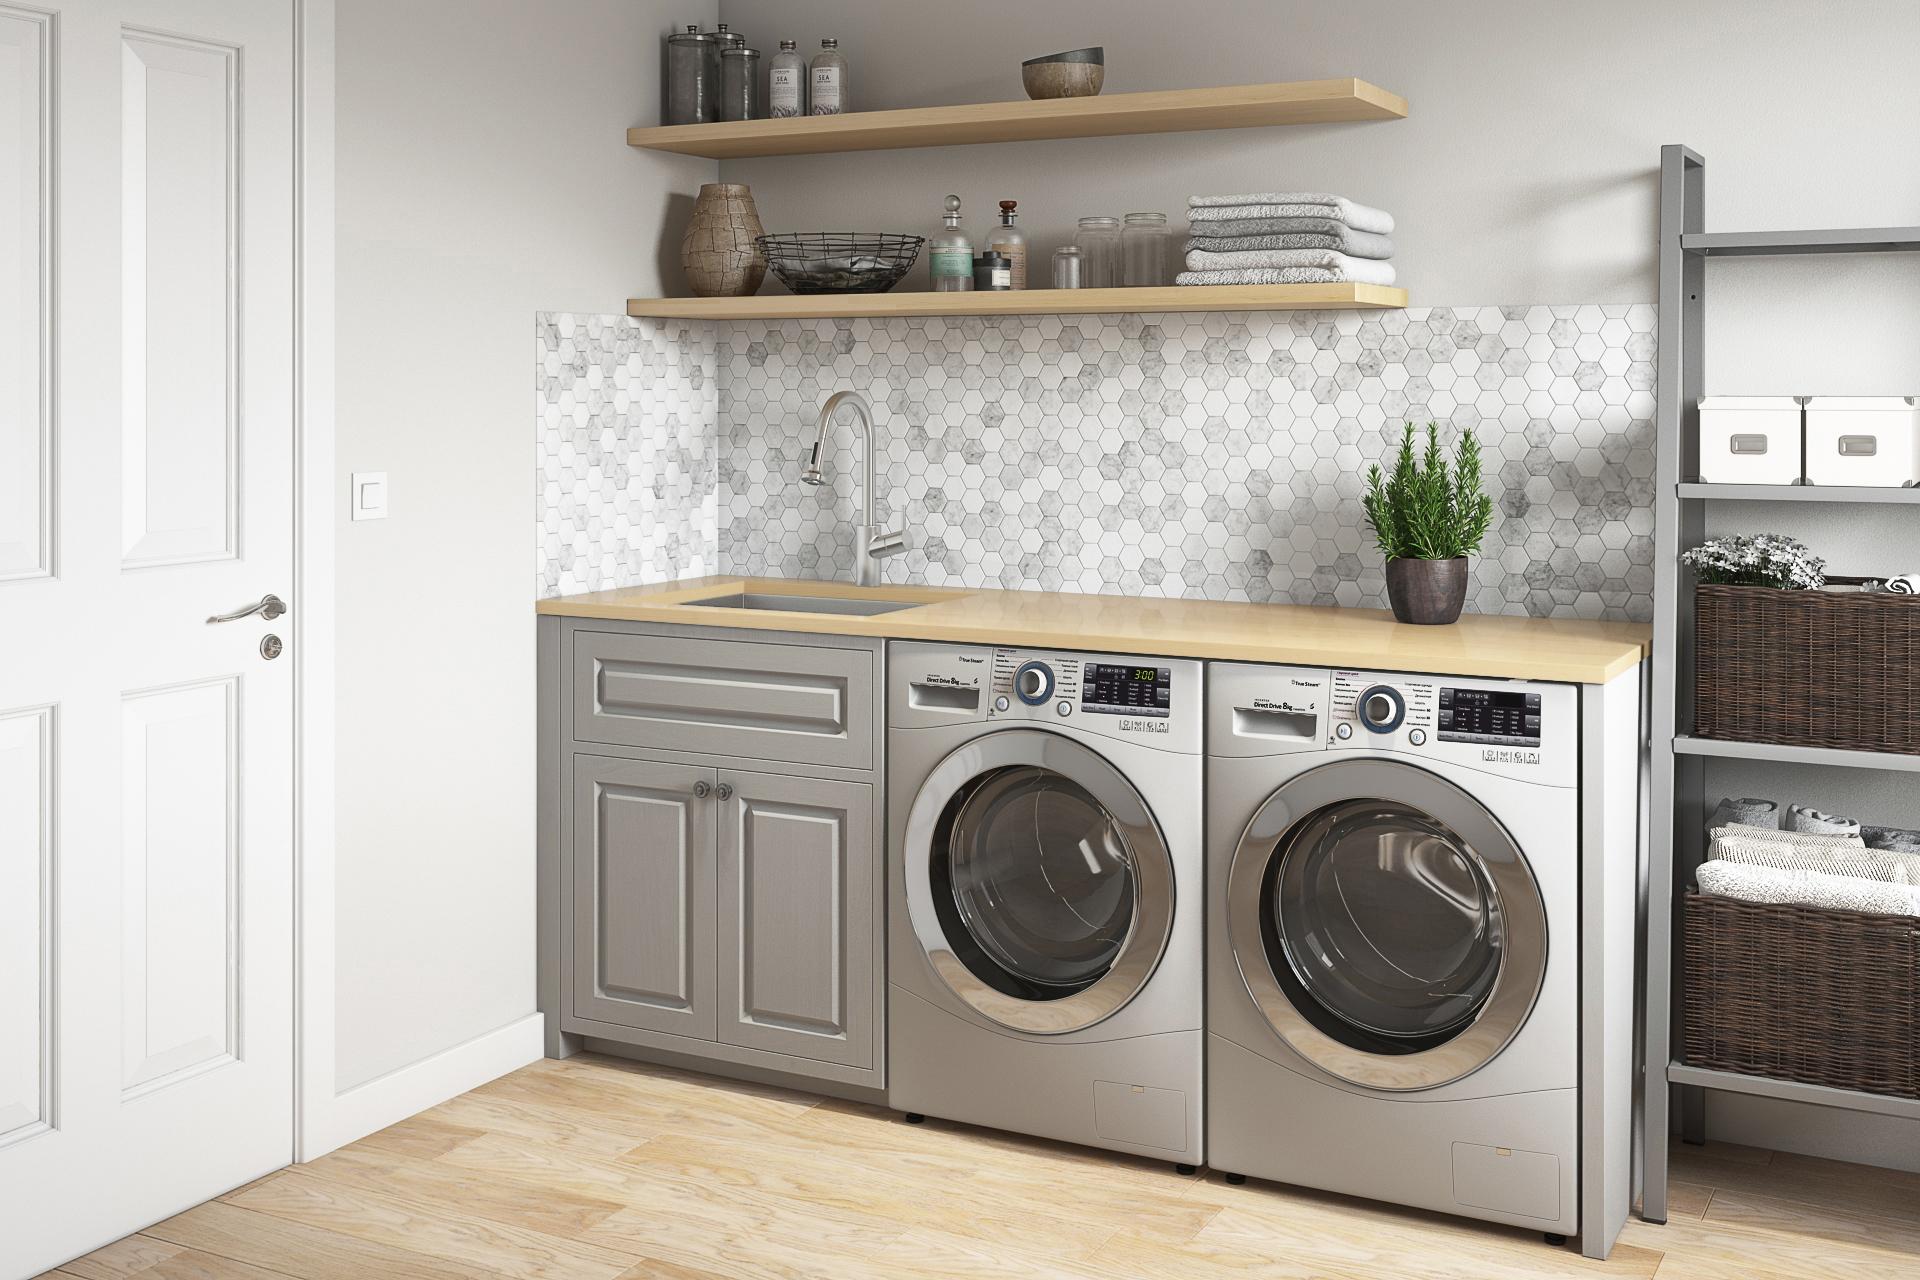 24 x 18 x 13 deep laundry utility